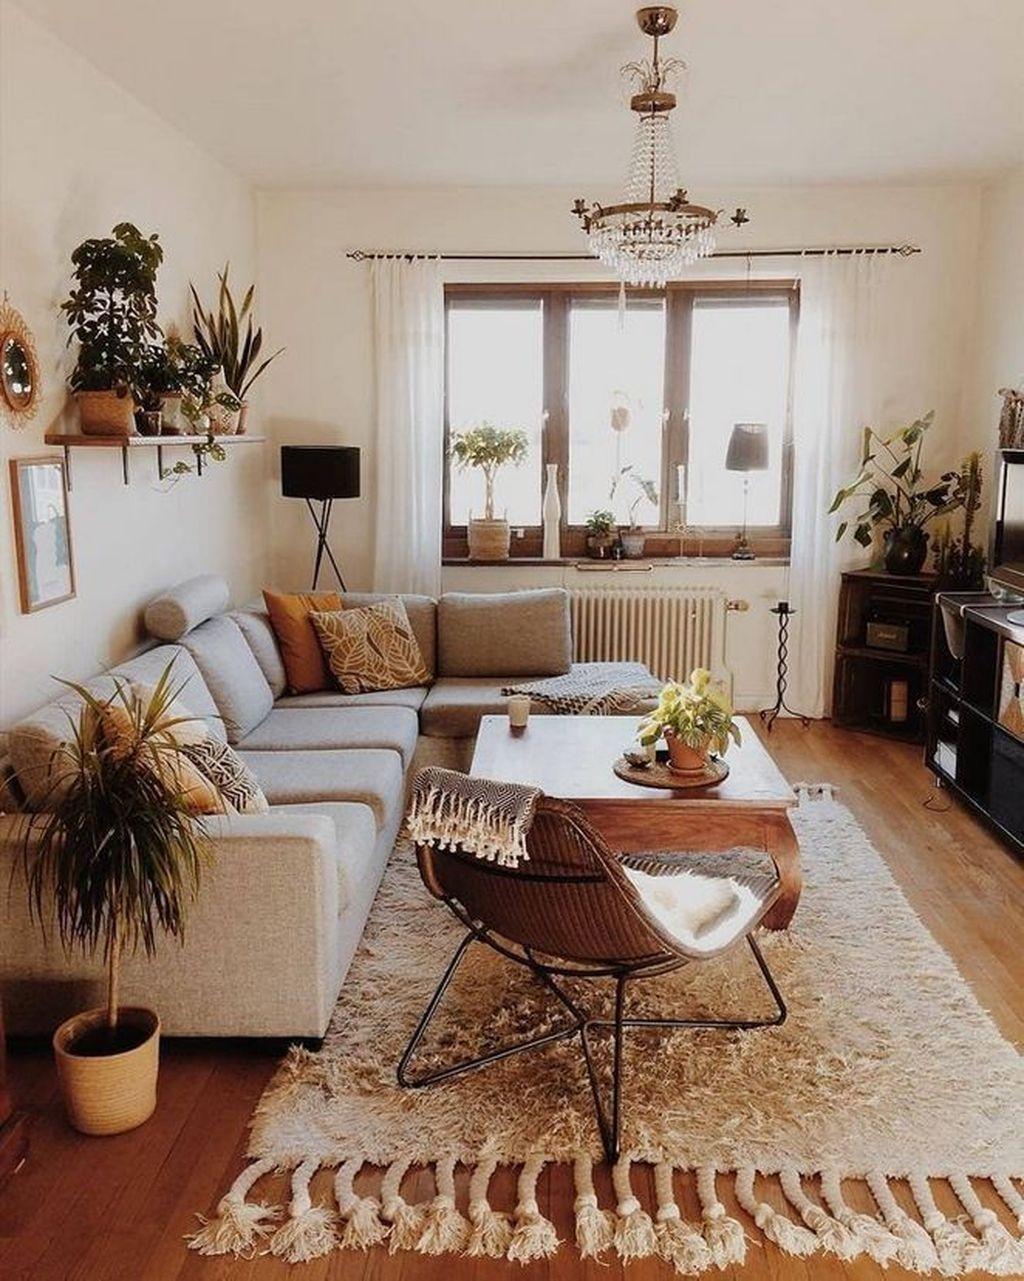 42+ Apartment living room ideas on a budget ideas